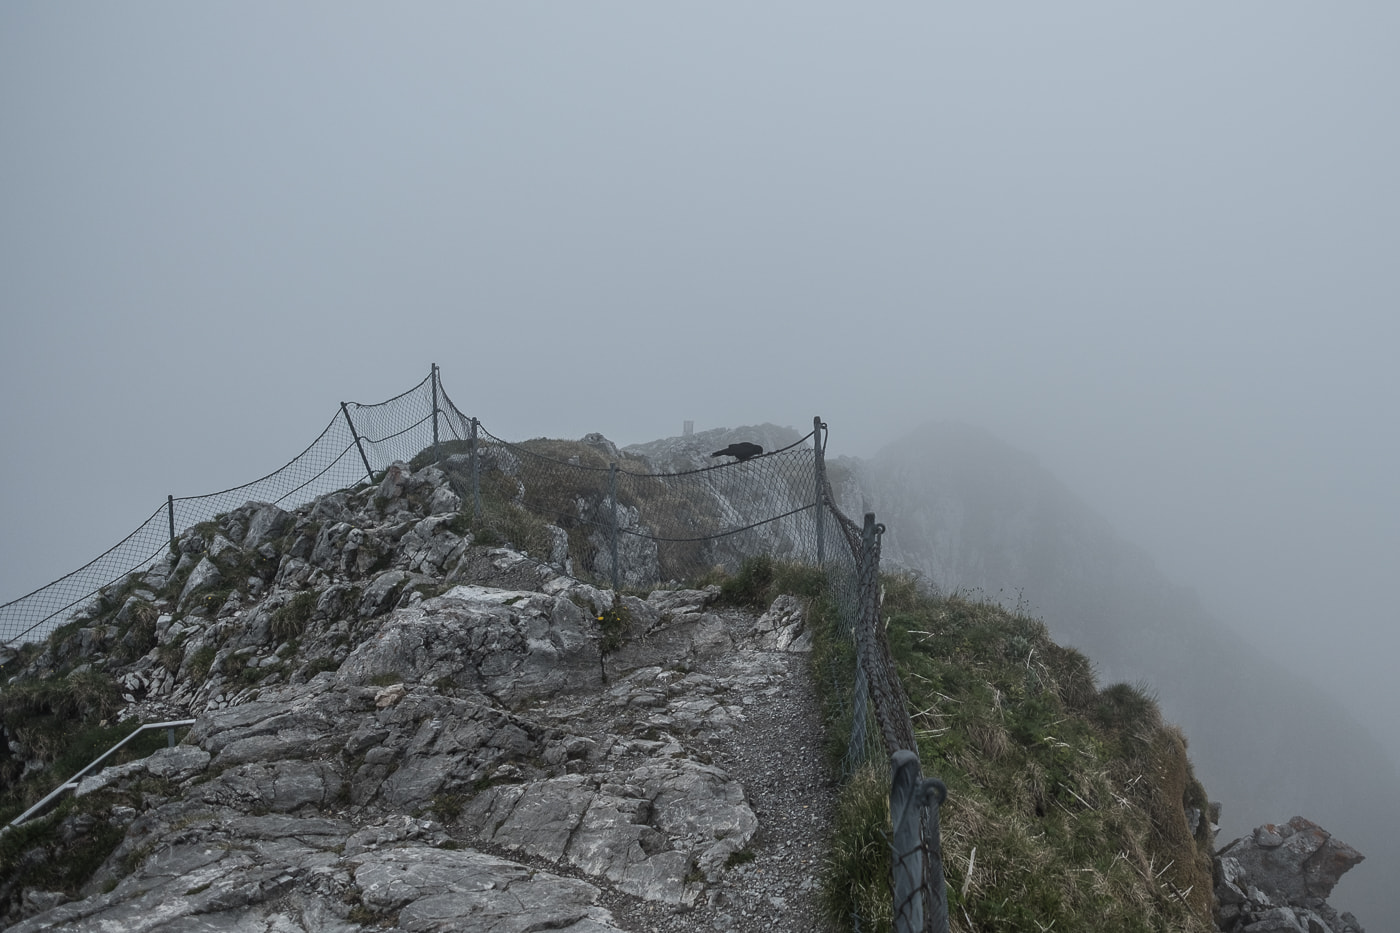 stockhorn gipfel im nebel